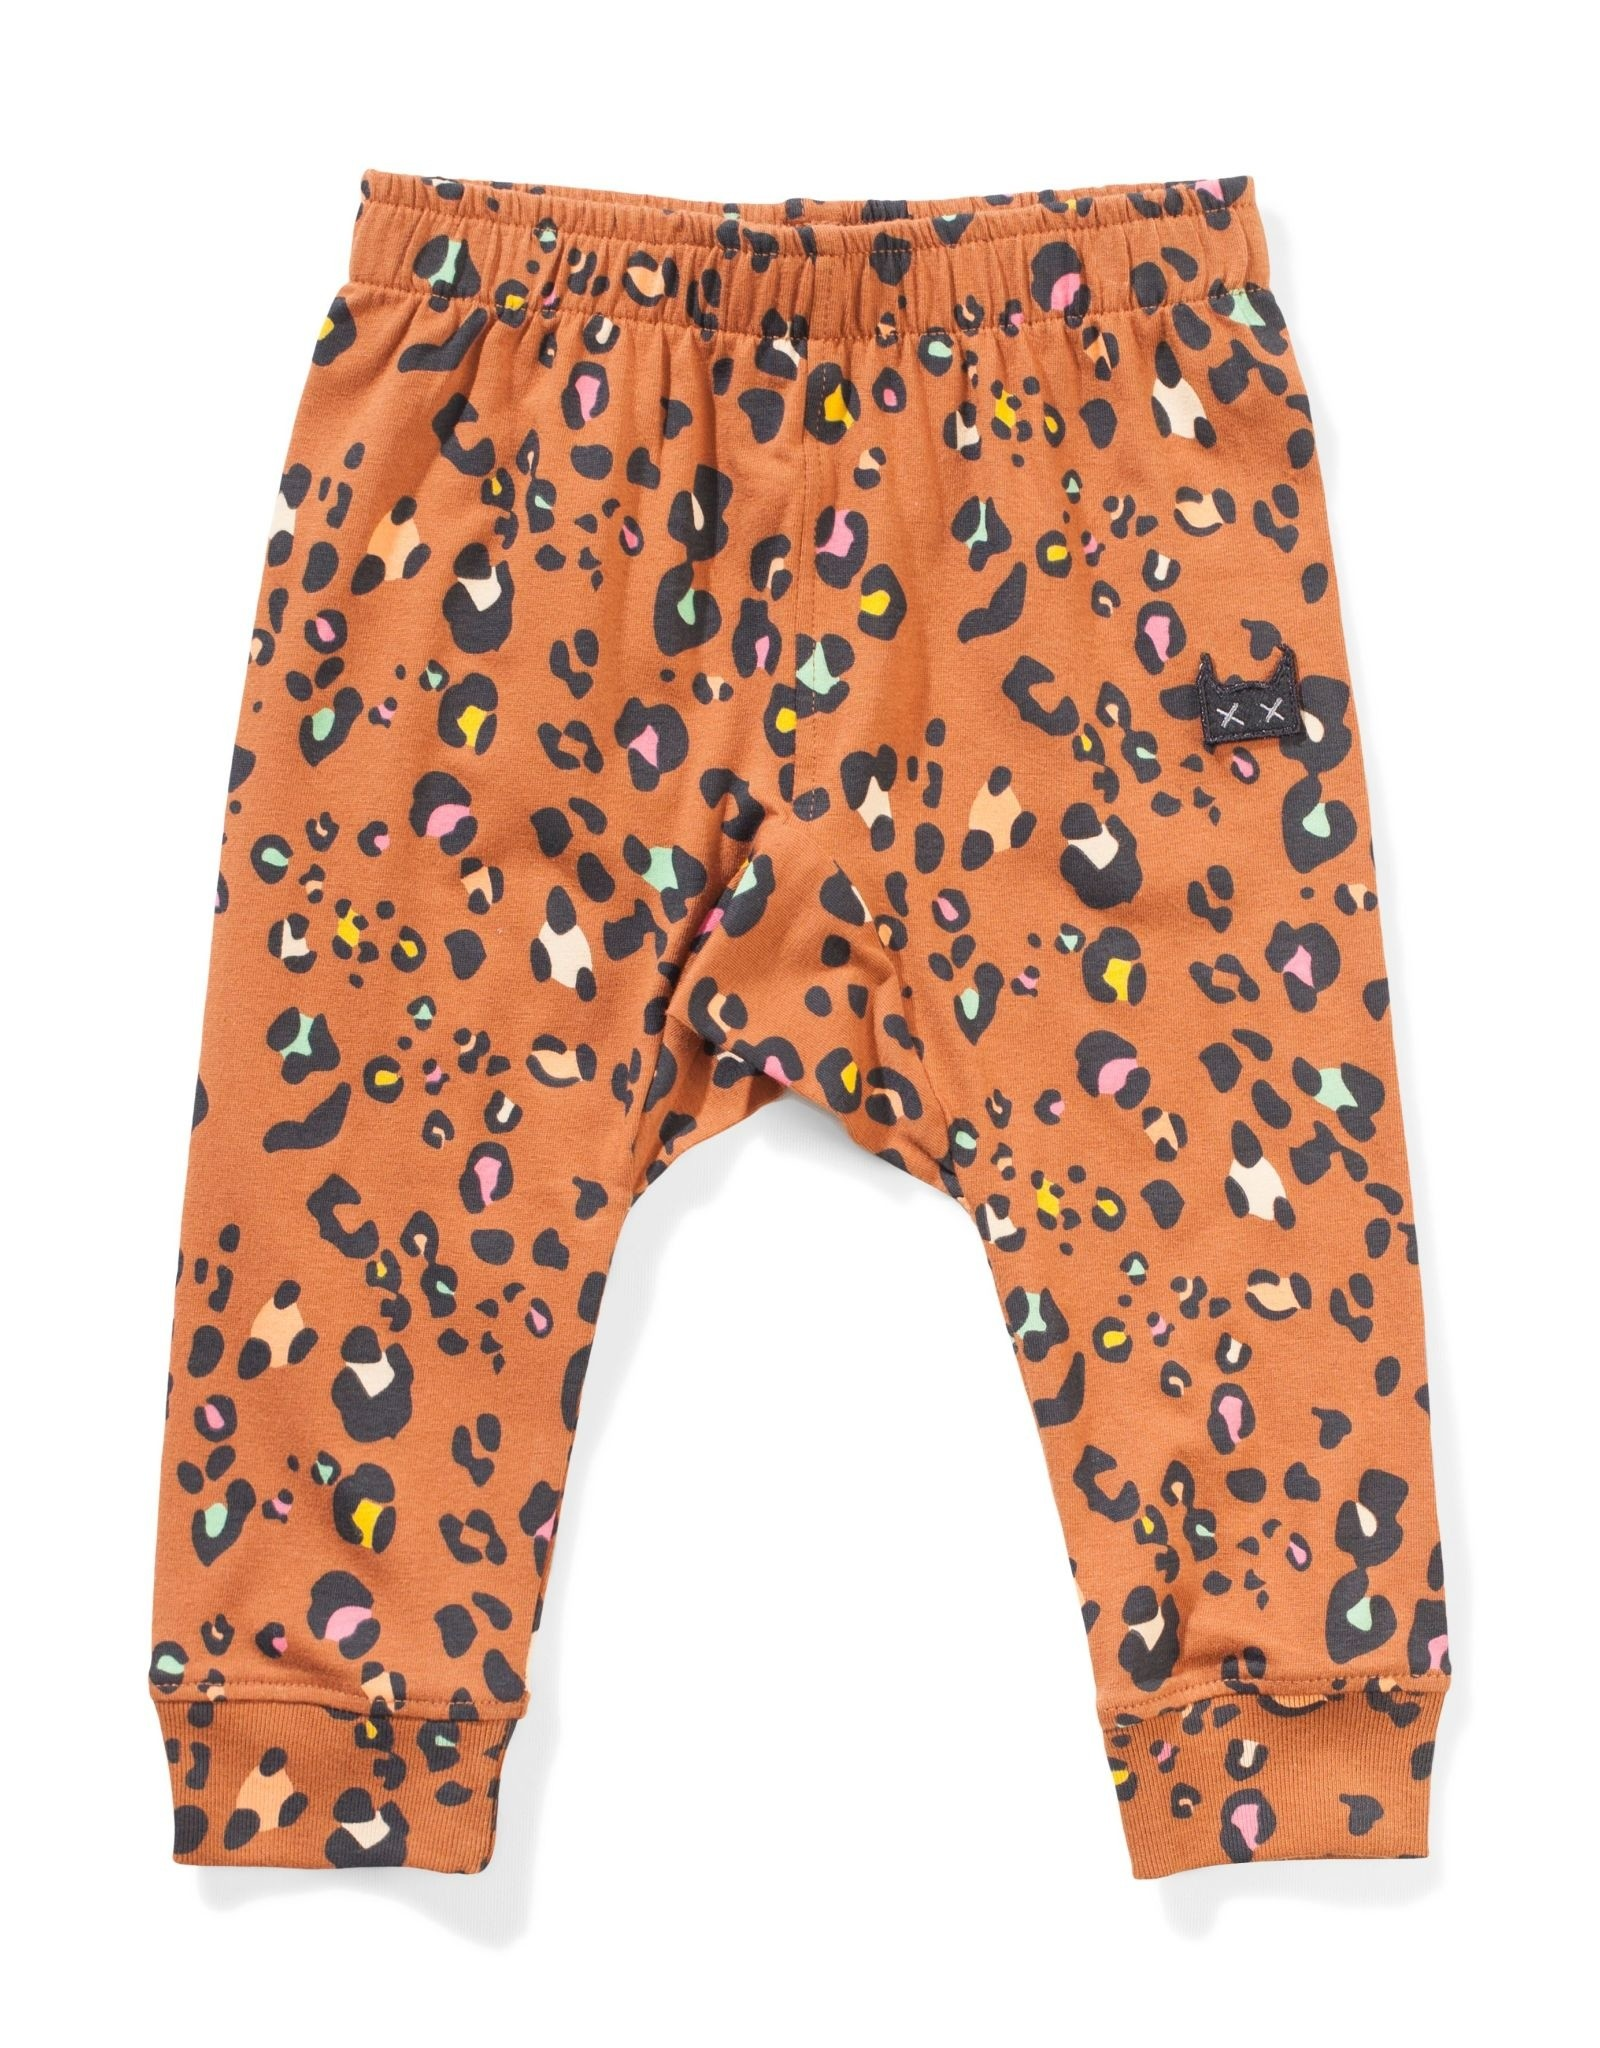 Munster Kids leopard potion pant